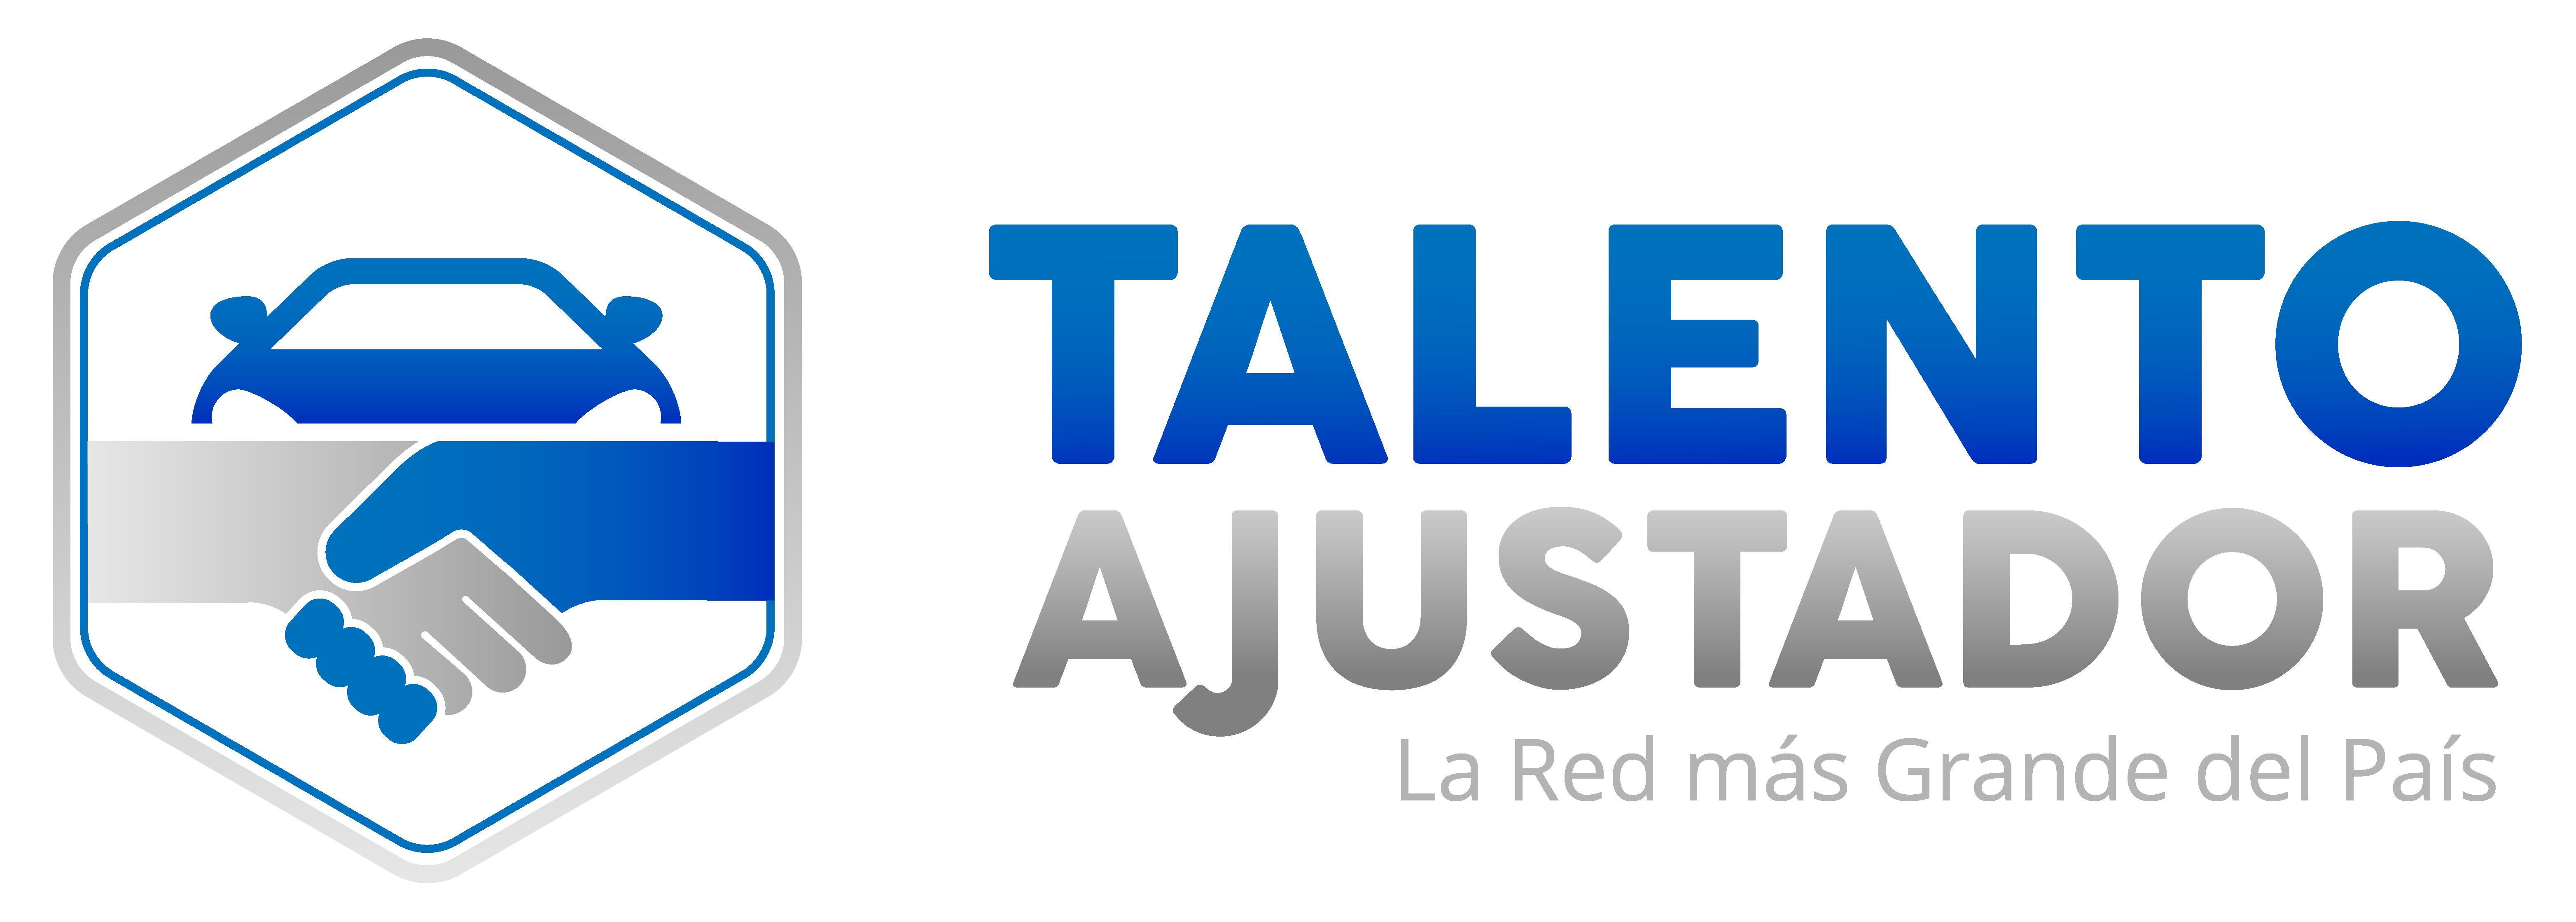 TalentoAjustador